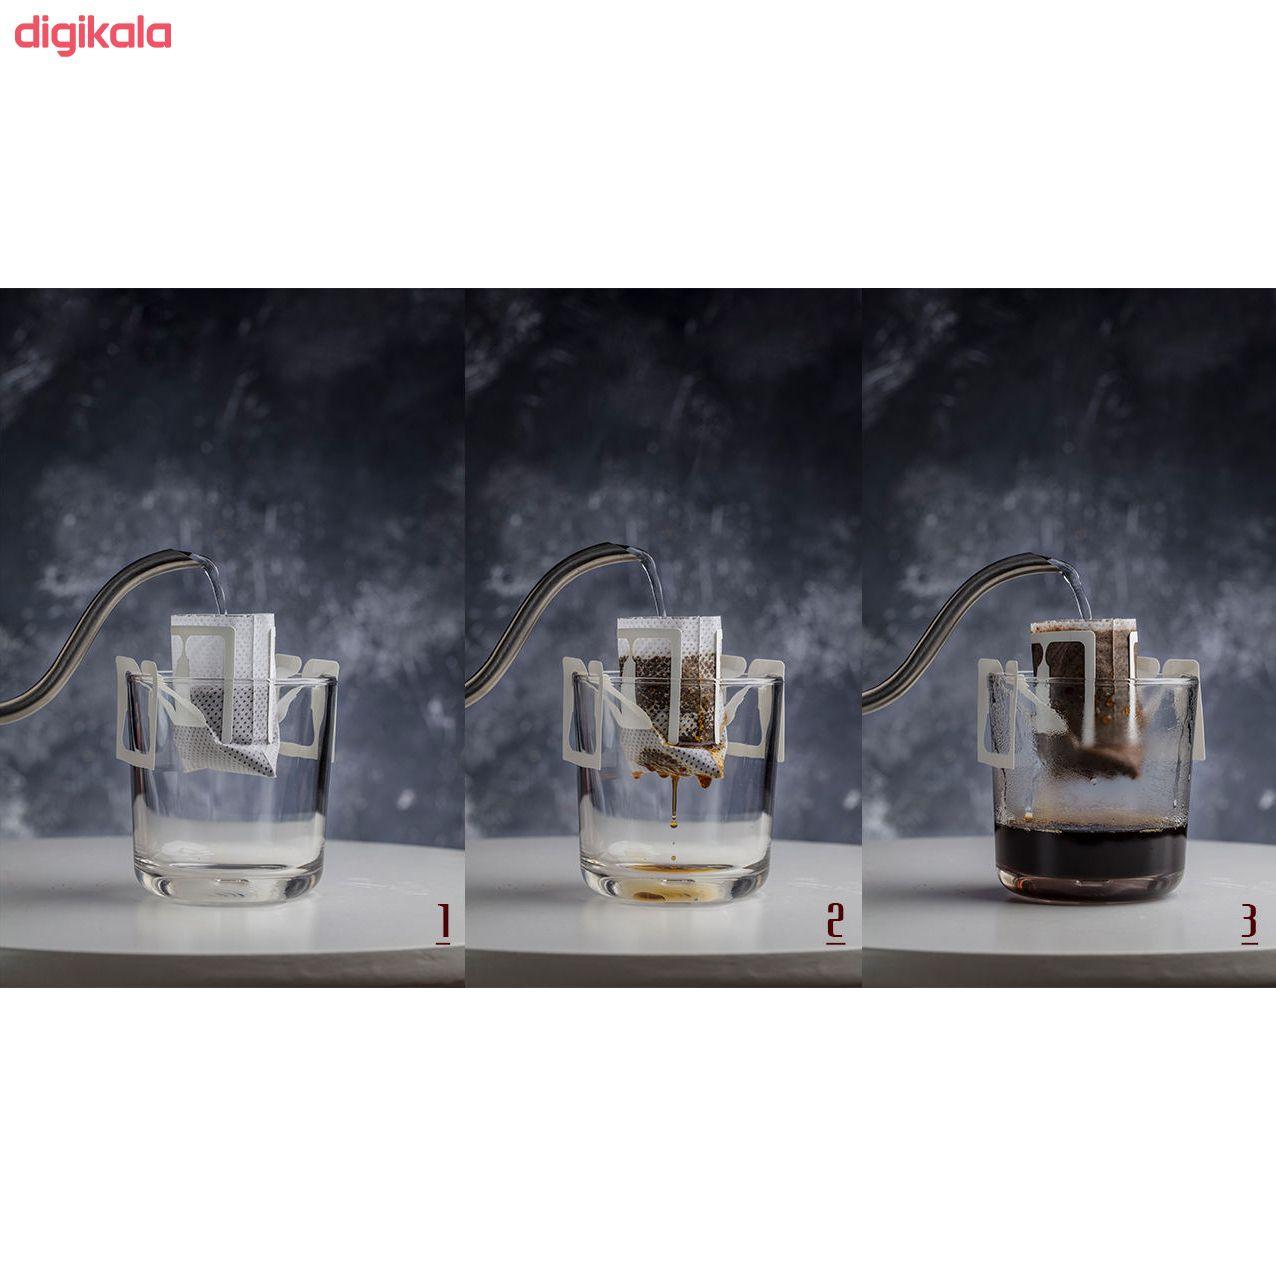 قهوه نورسکا بن مانو - بسته 12 عددی main 1 4